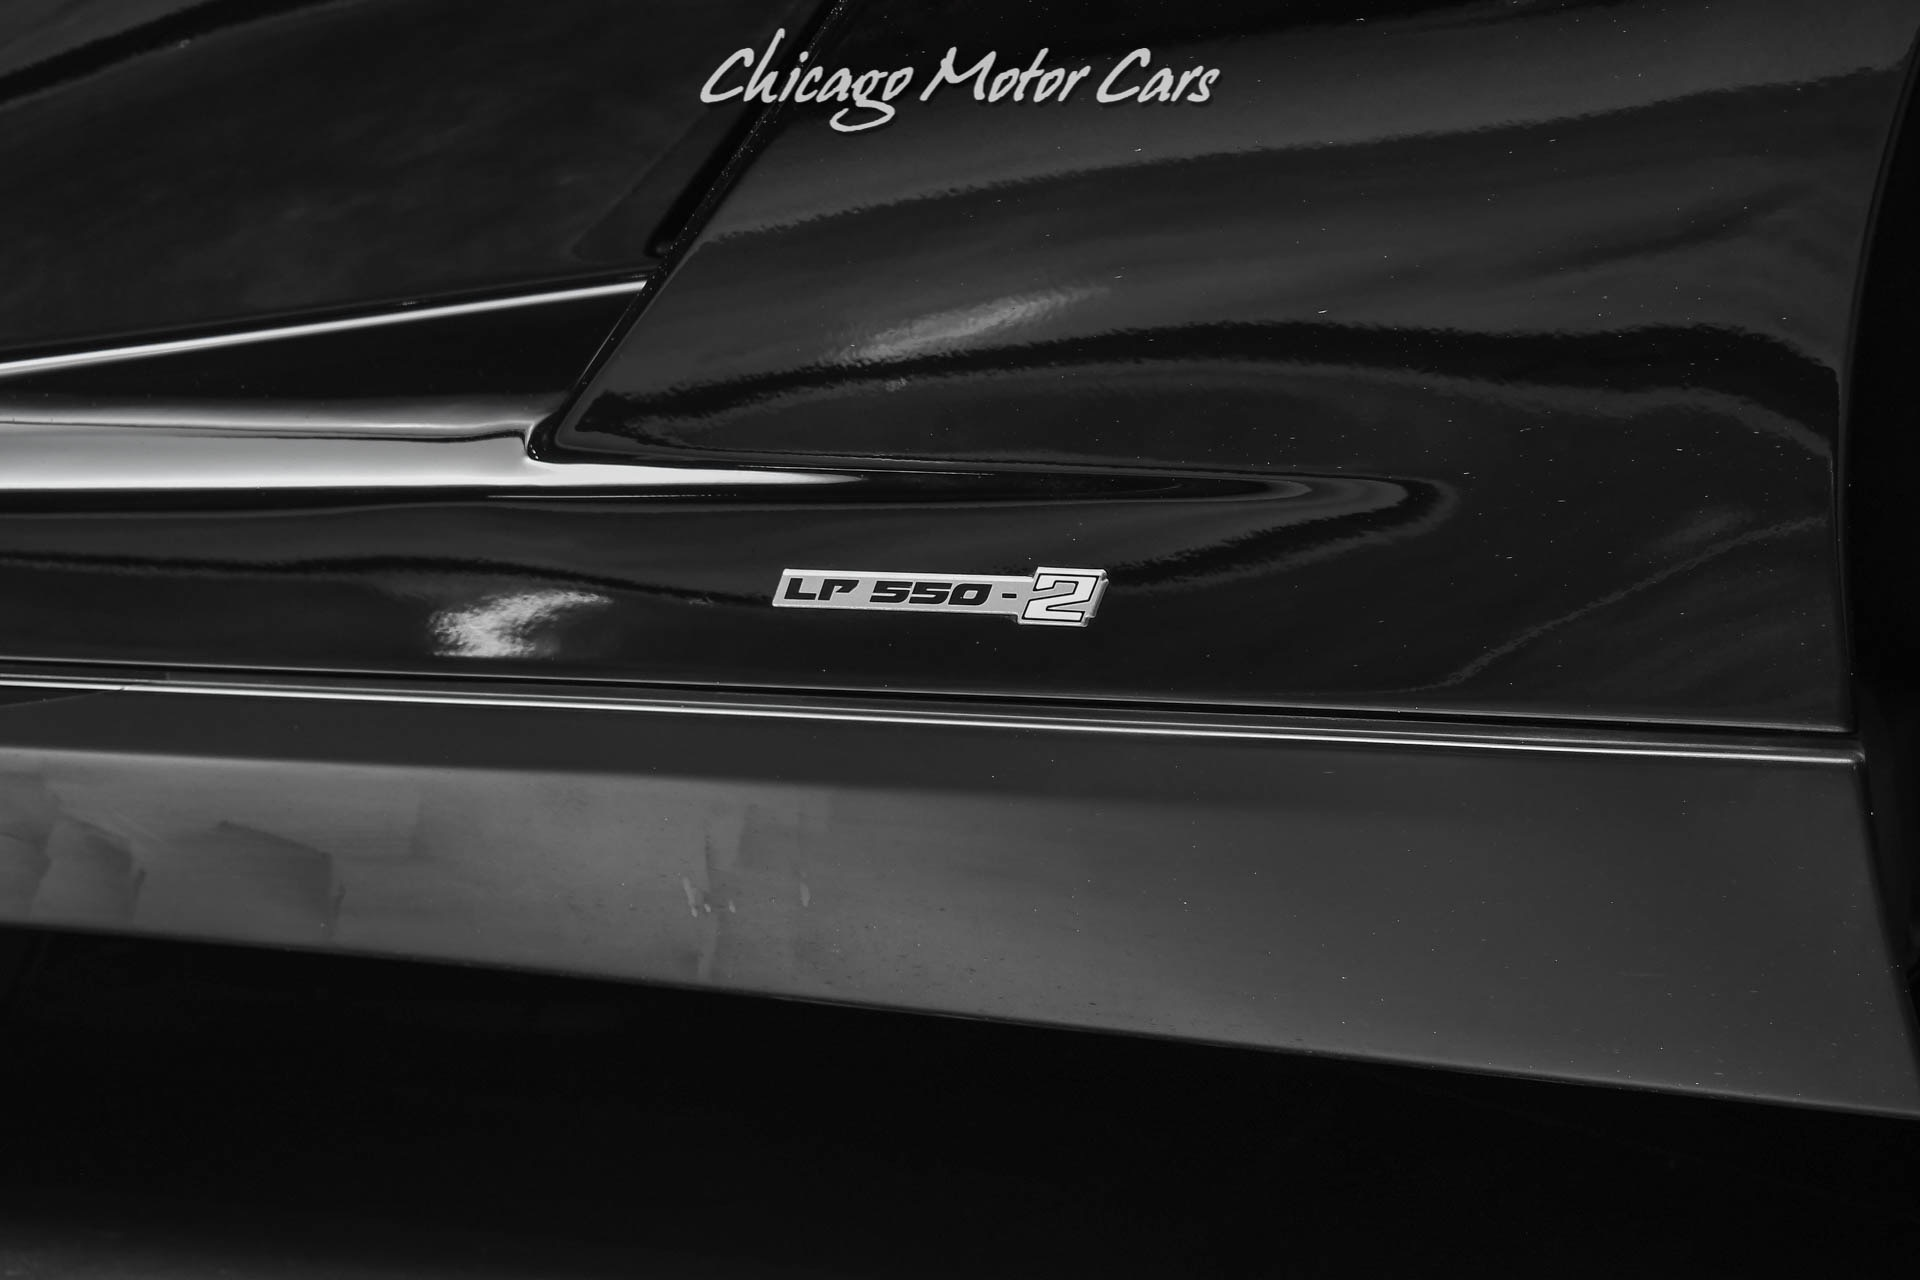 Used-2013-Lamborghini-Gallardo-LP550-2-Spyder-Convertible-ADV1-Wheels-Q-Citura-Leather-VERY-RARE